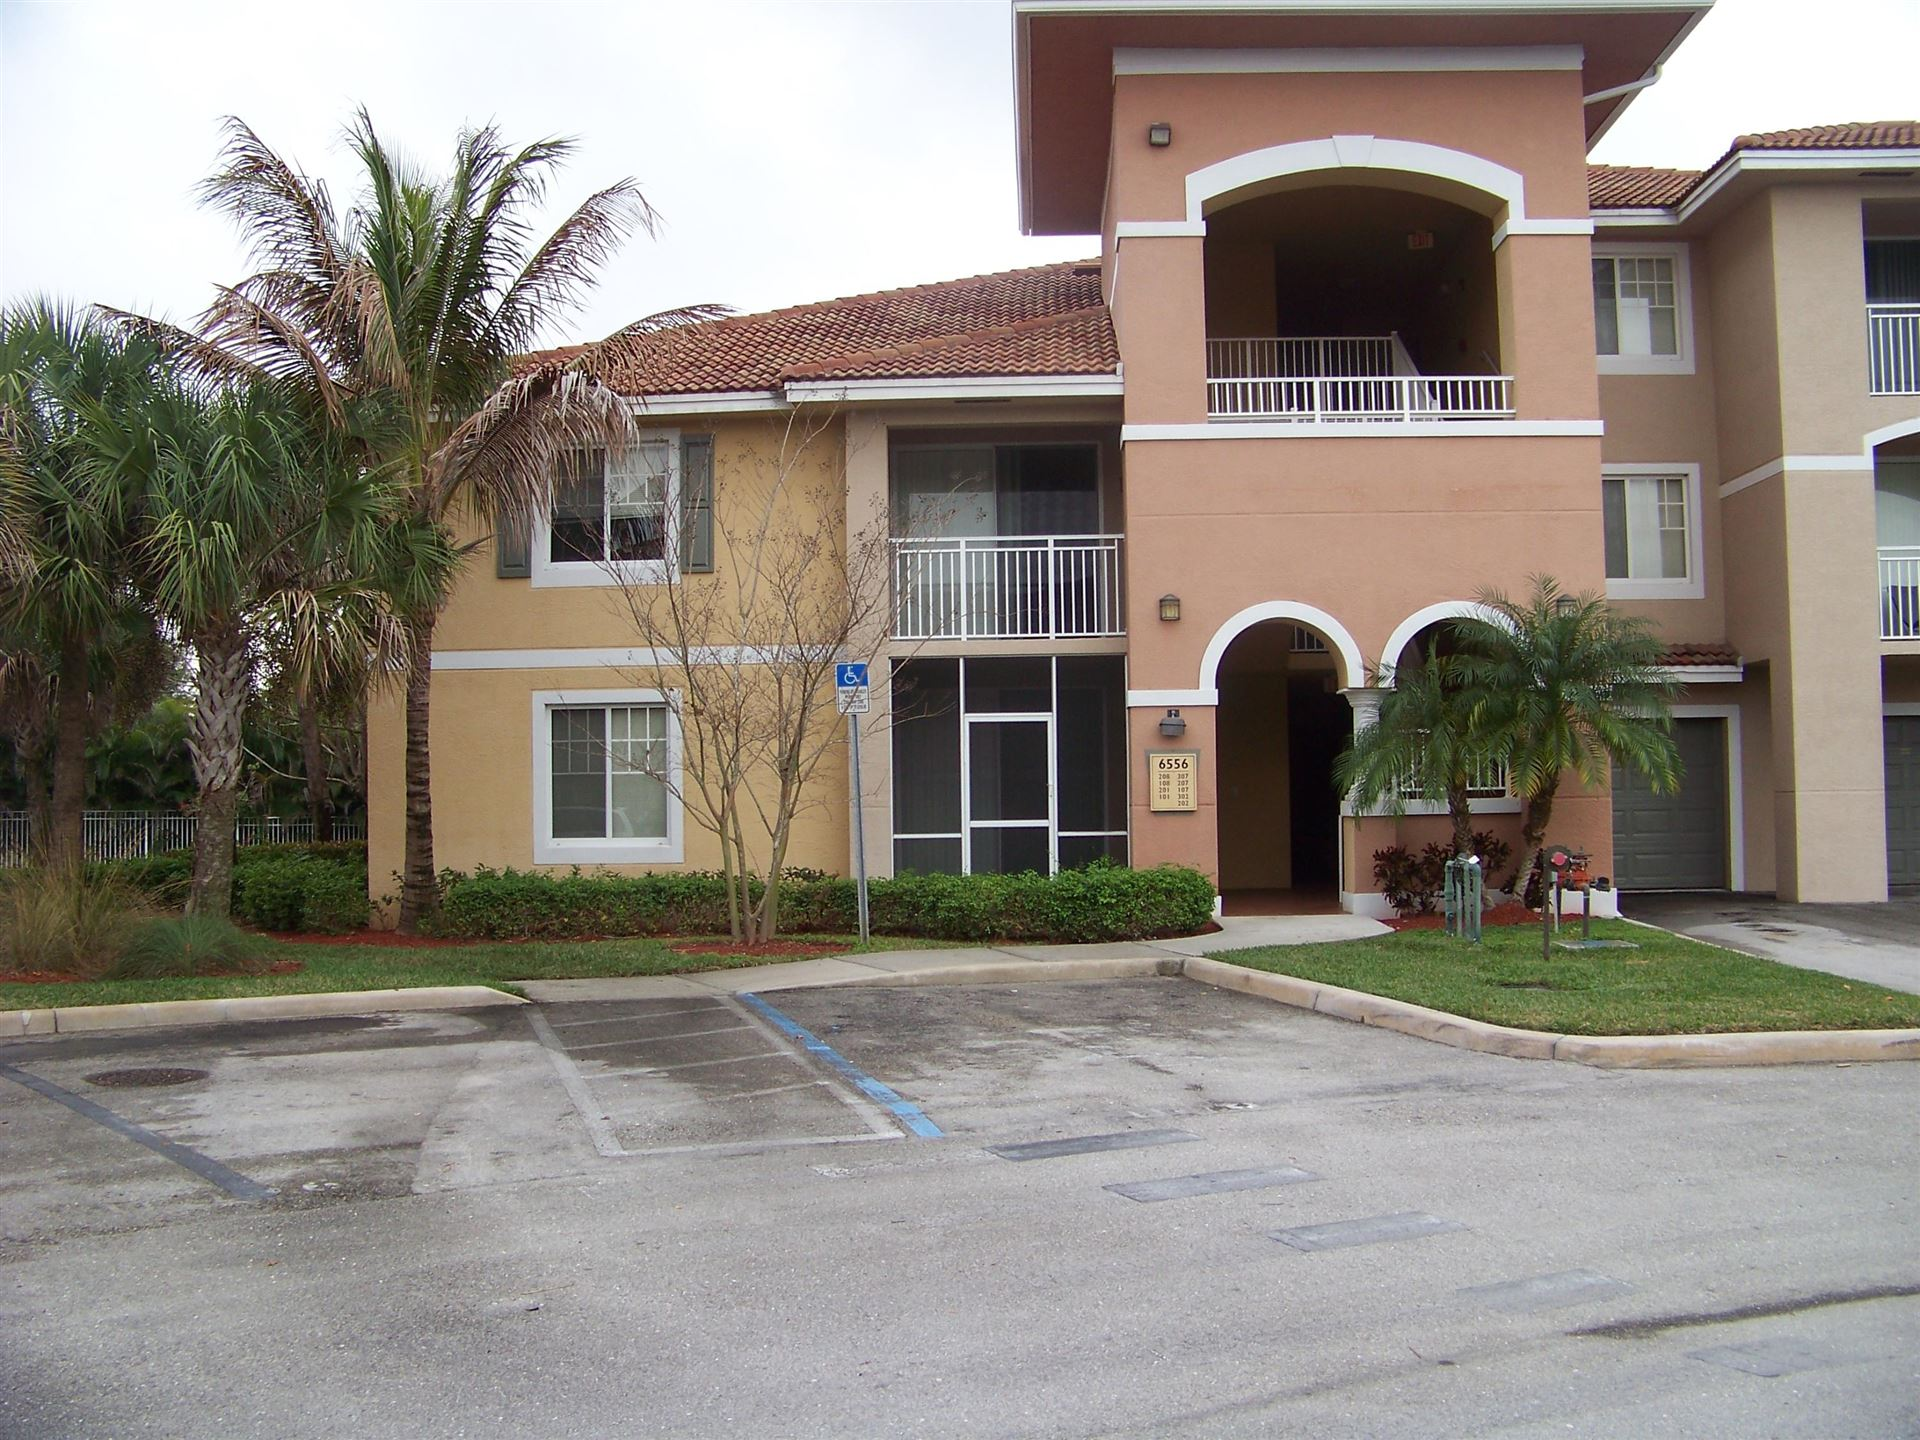 6556 Emerald Dunes Drive #201, West Palm Beach, FL 33411 - #: RX-10712639